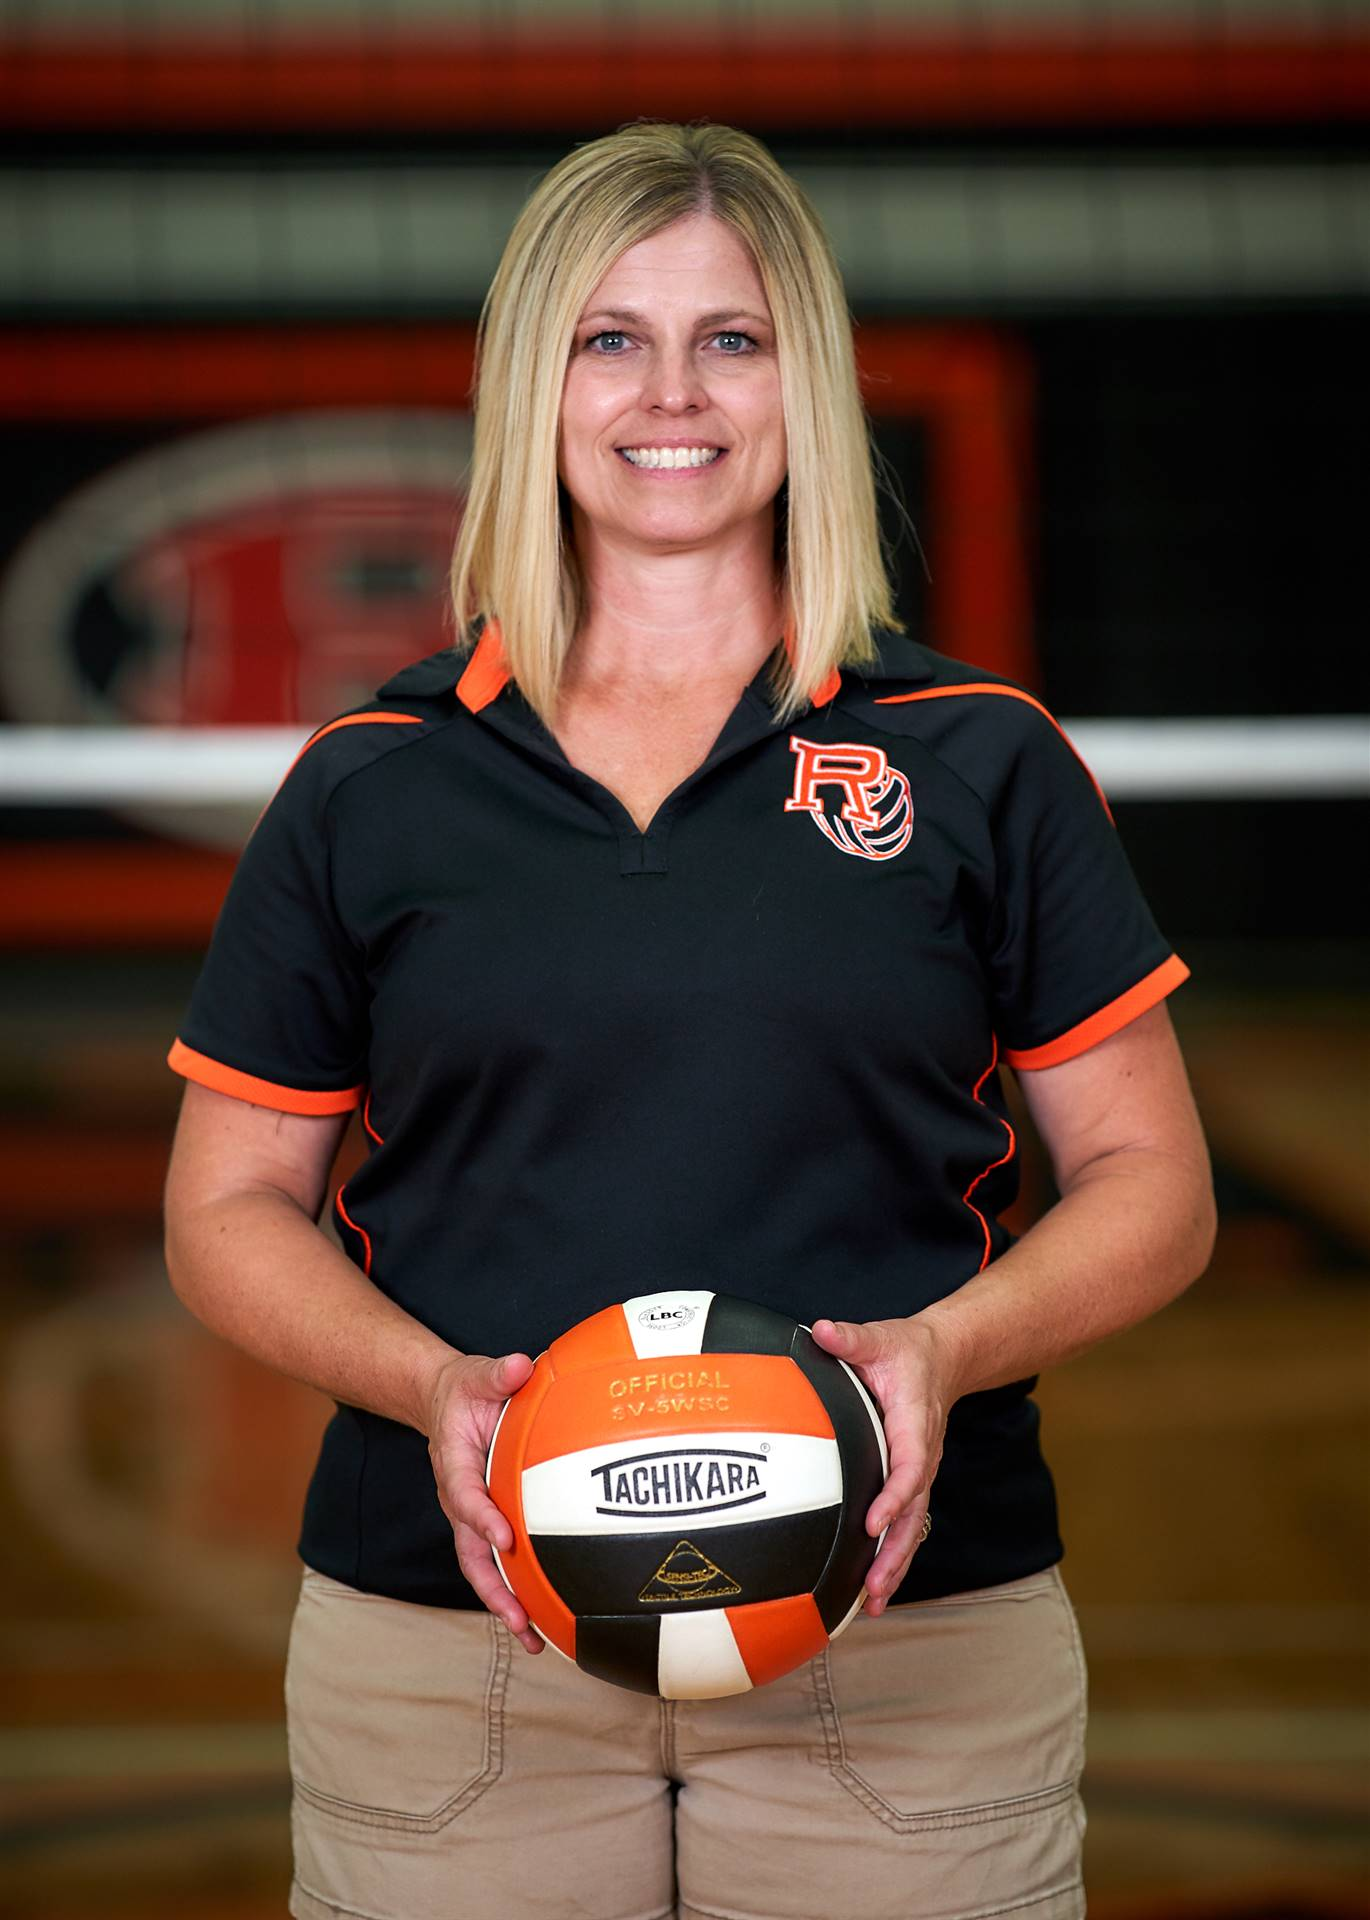 HS VB - Head Coach Brenda McCoy